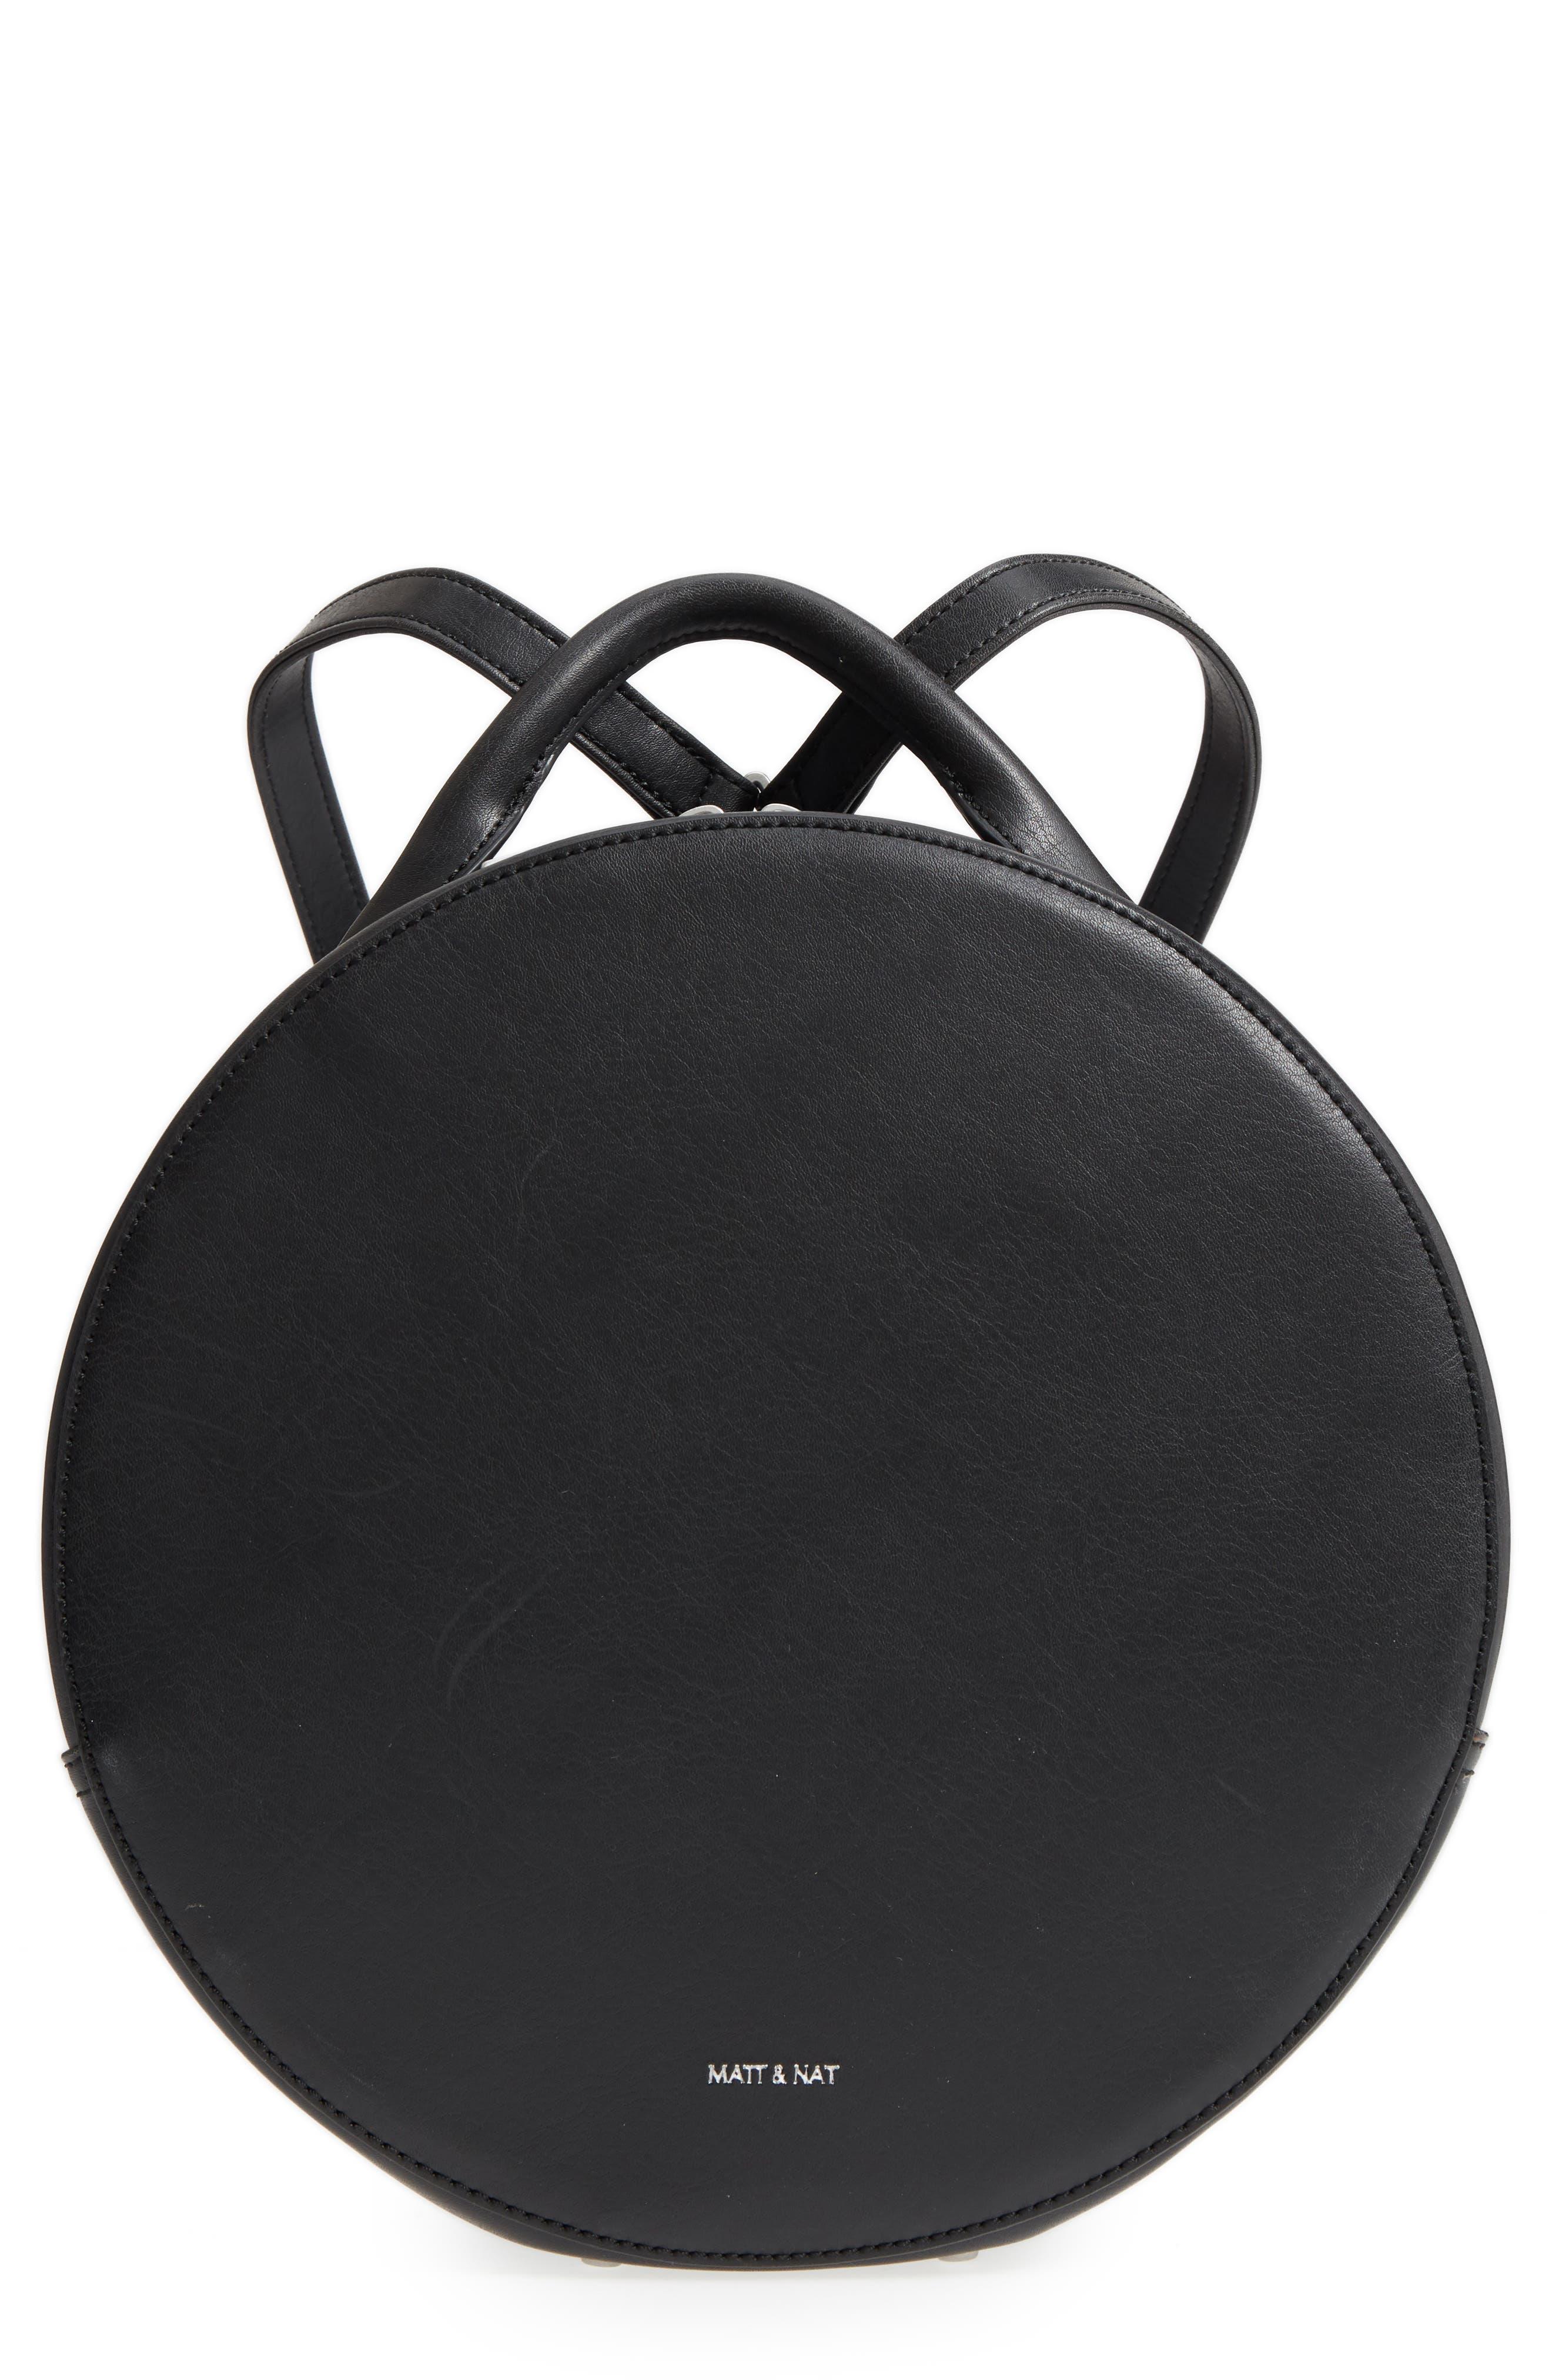 Matt & Nat Kiara Faux Leather Circle Backpack